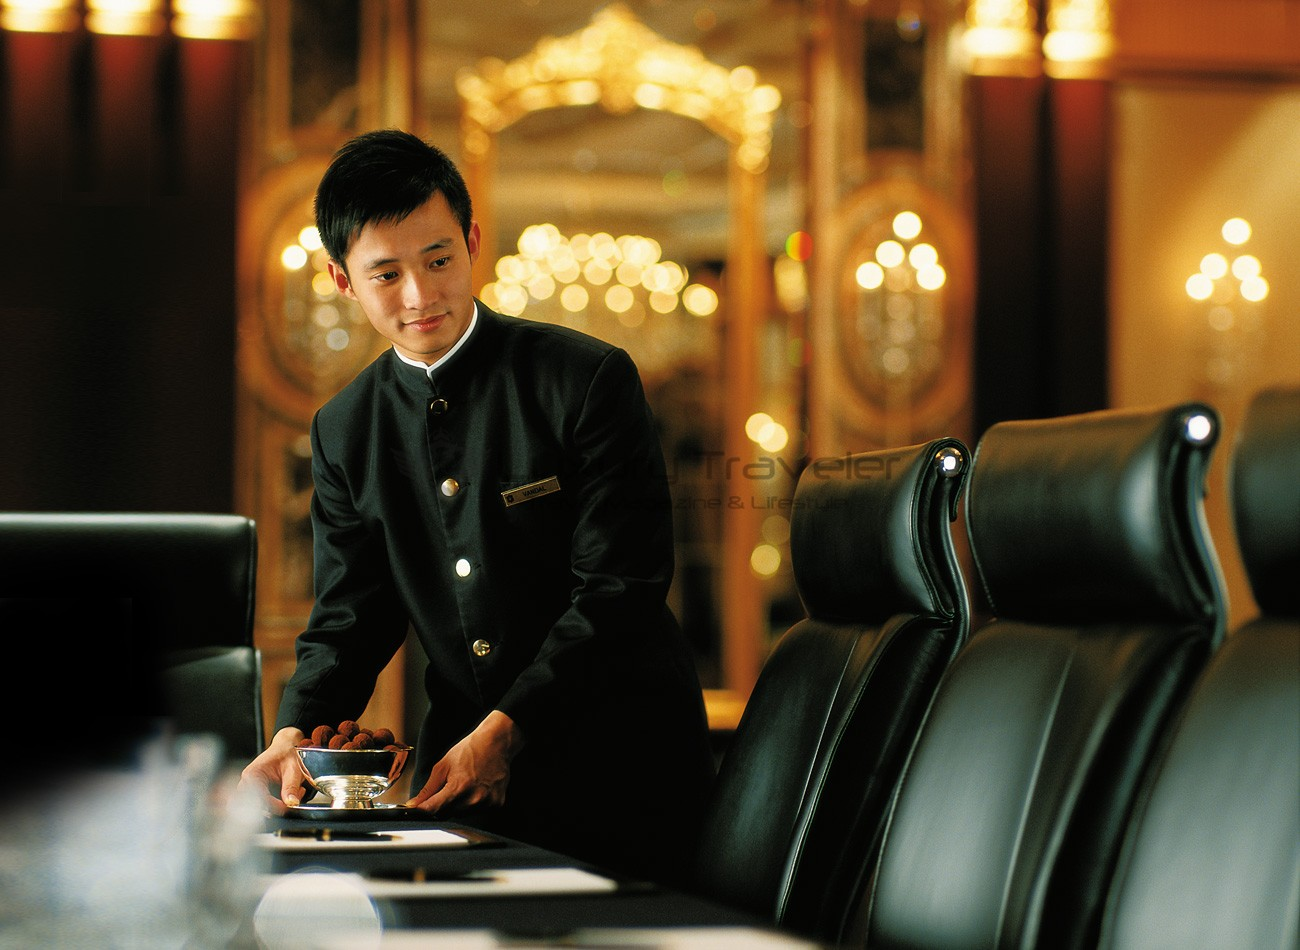 Island_Shangri-La_Hotel_Hong_Kong_Concierge_Staff